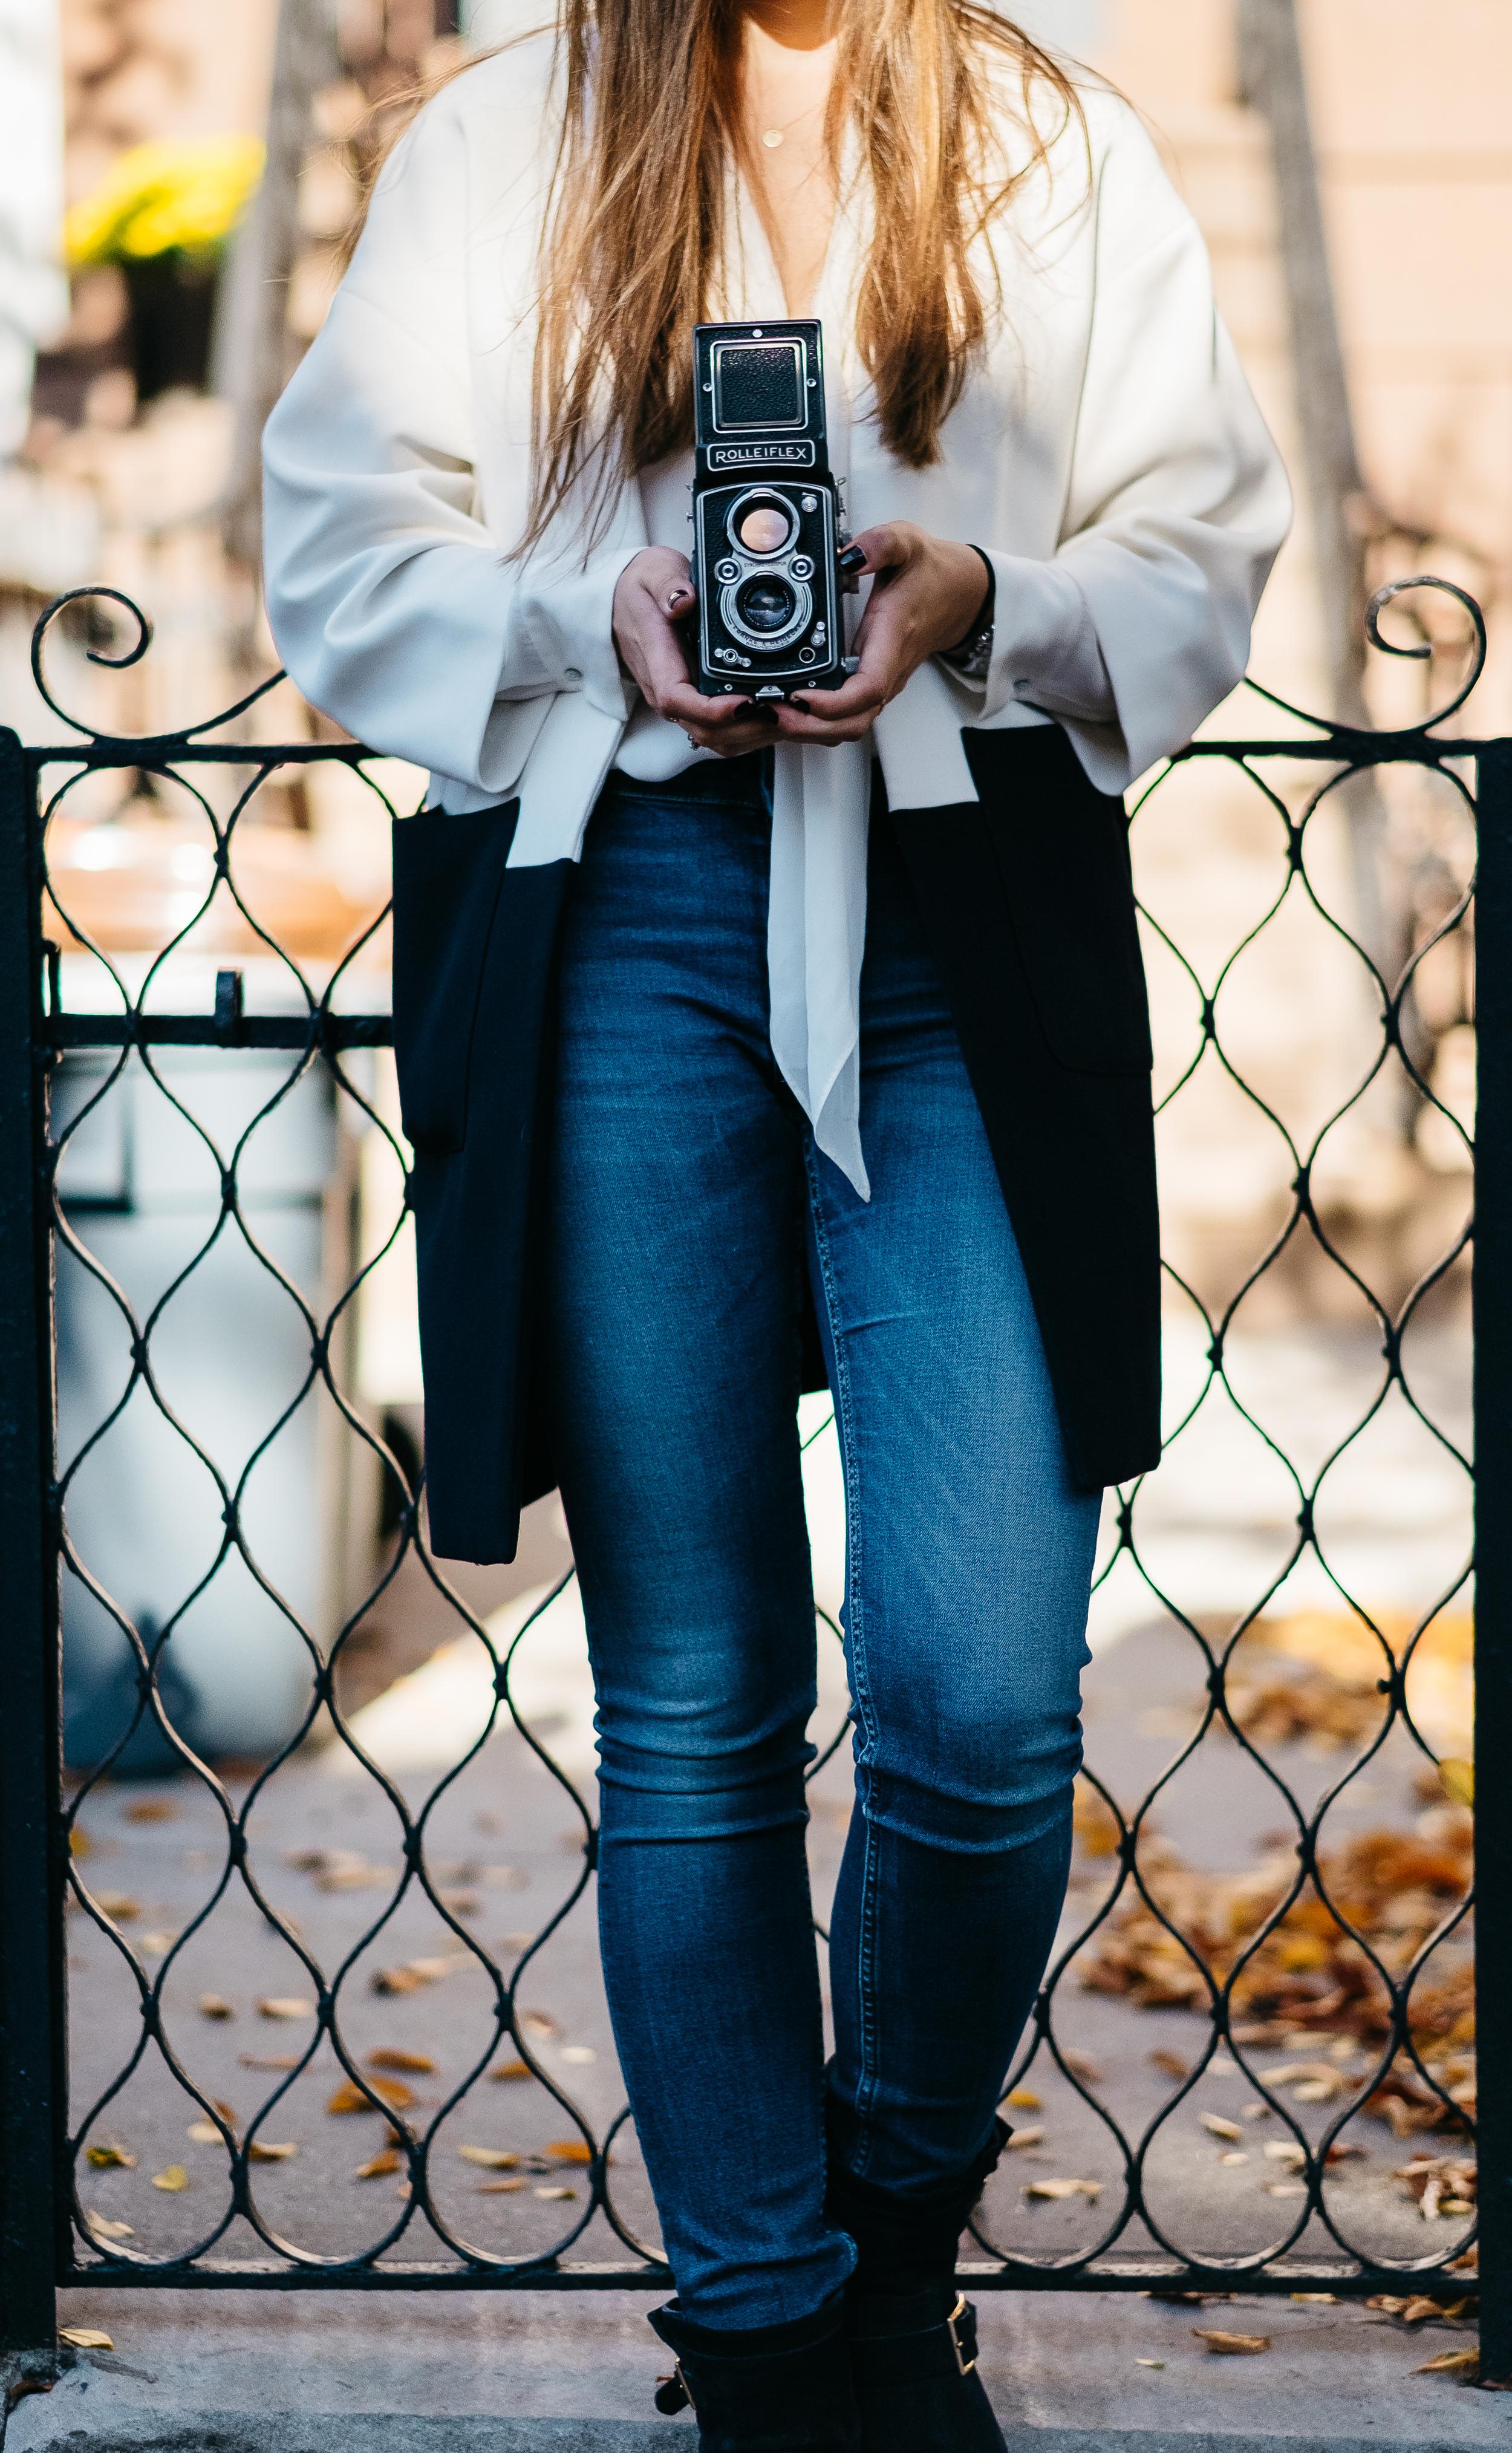 Sophie-Svoboda-Autumn-Portrait-17.jpg